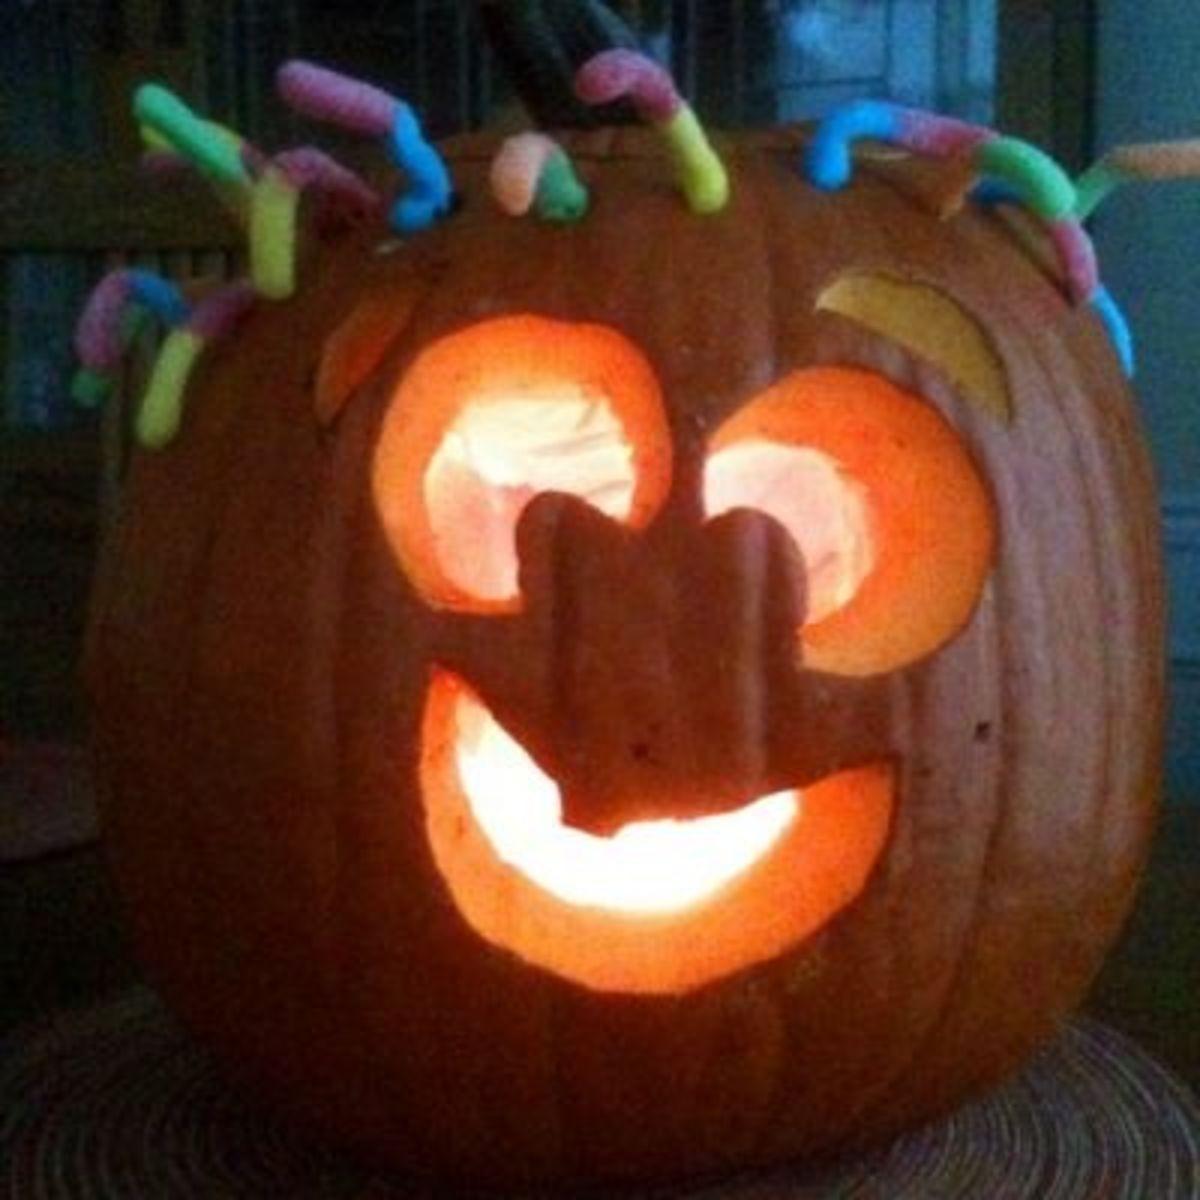 Carved Goofy Jackolantern Lit Up